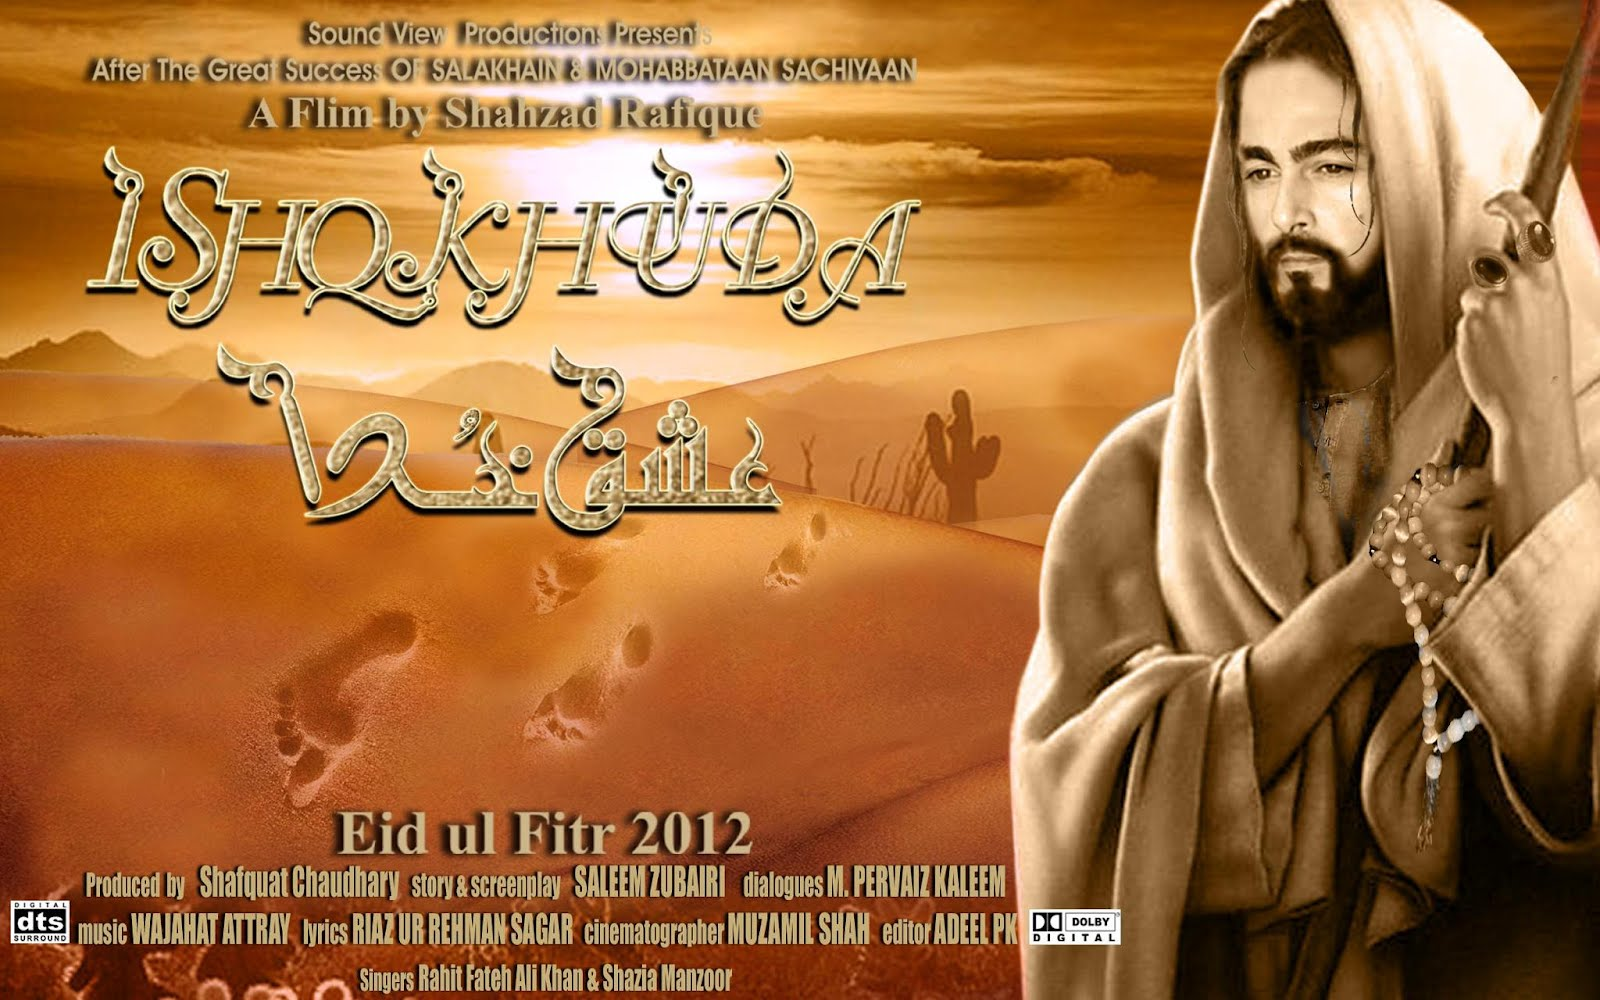 Ishq Khuda Poster